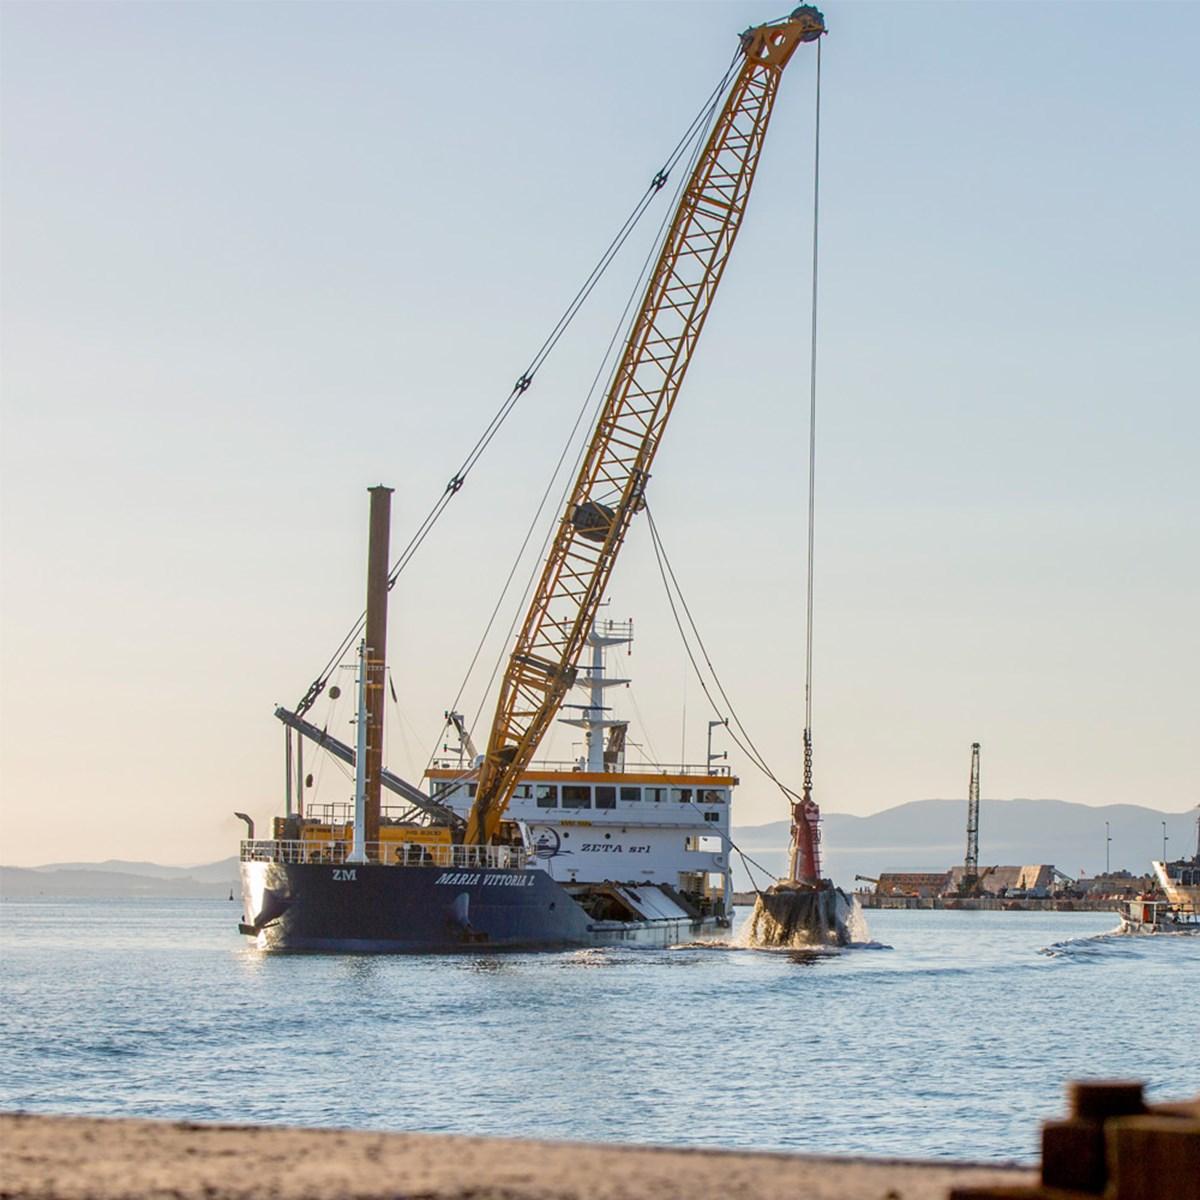 liebherr-hs-8300-hybrid-seilbagger-duty-cycle-crawler-crane-dredging.jpg